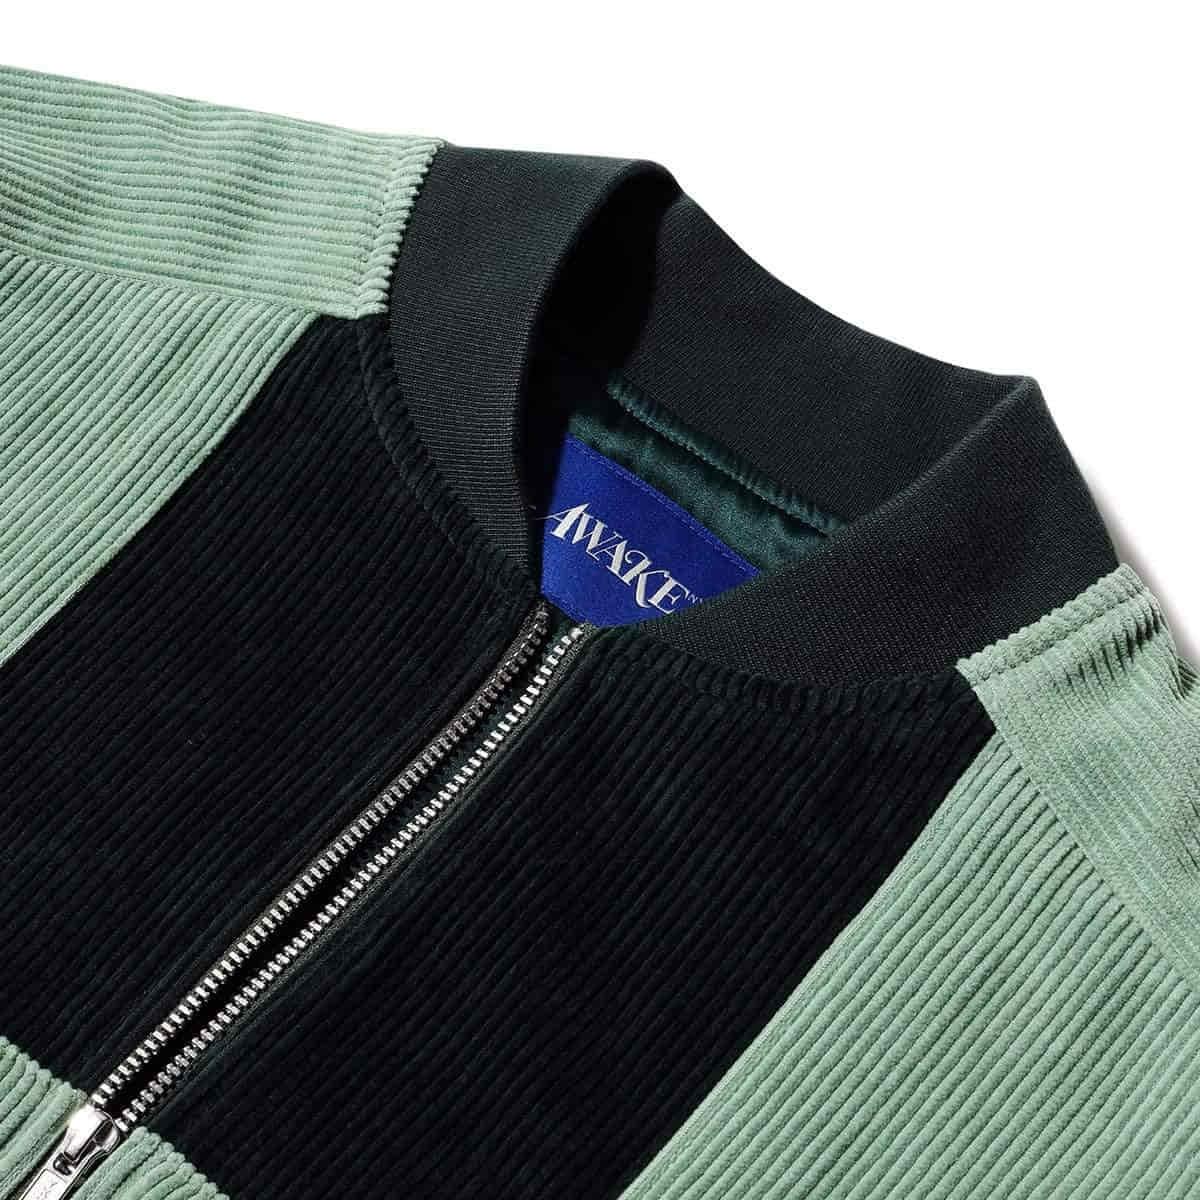 Awake Chenille Patch Corduroy Logo Jacket Green 4